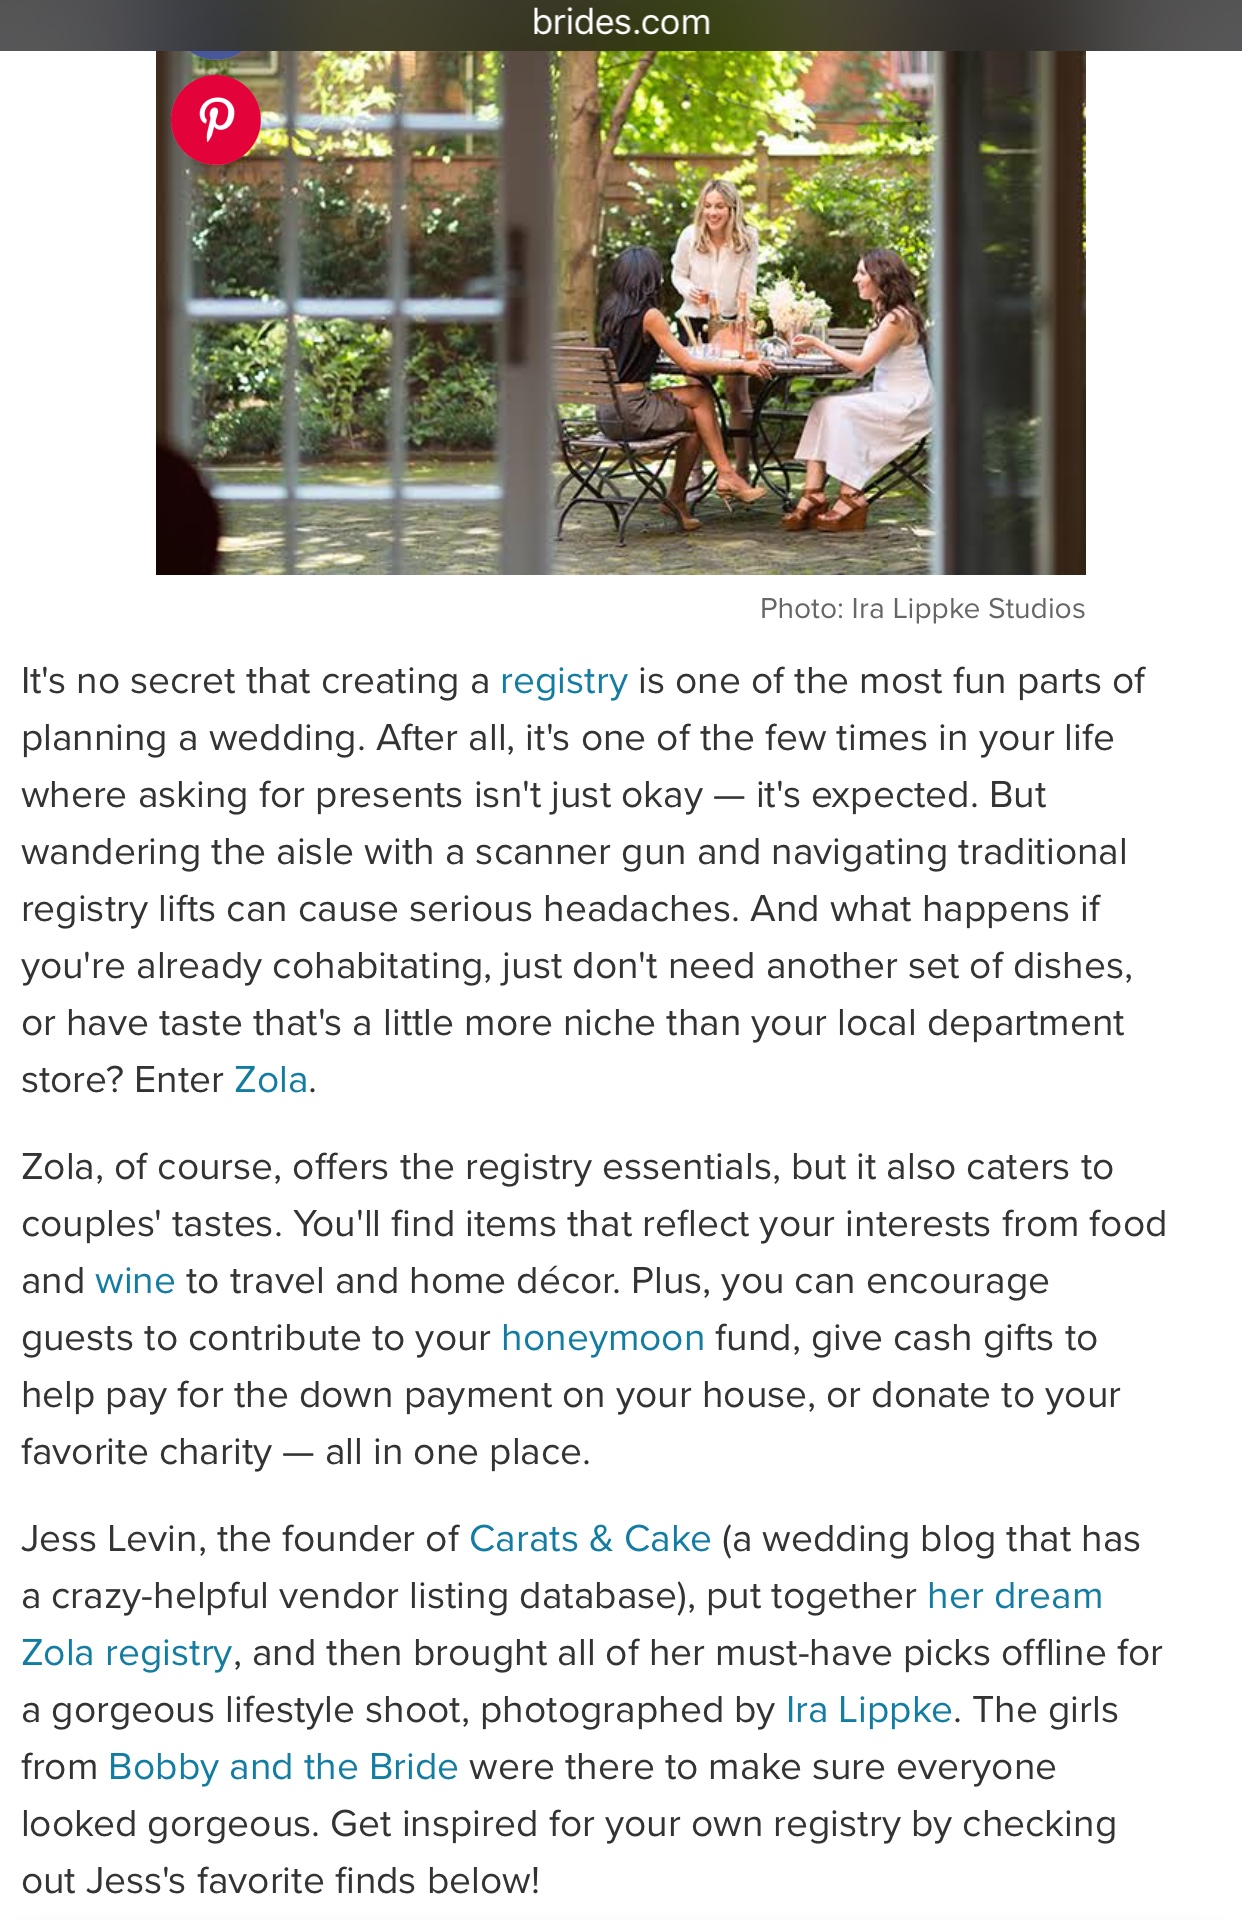 BRIDES CARATS AND CAKE